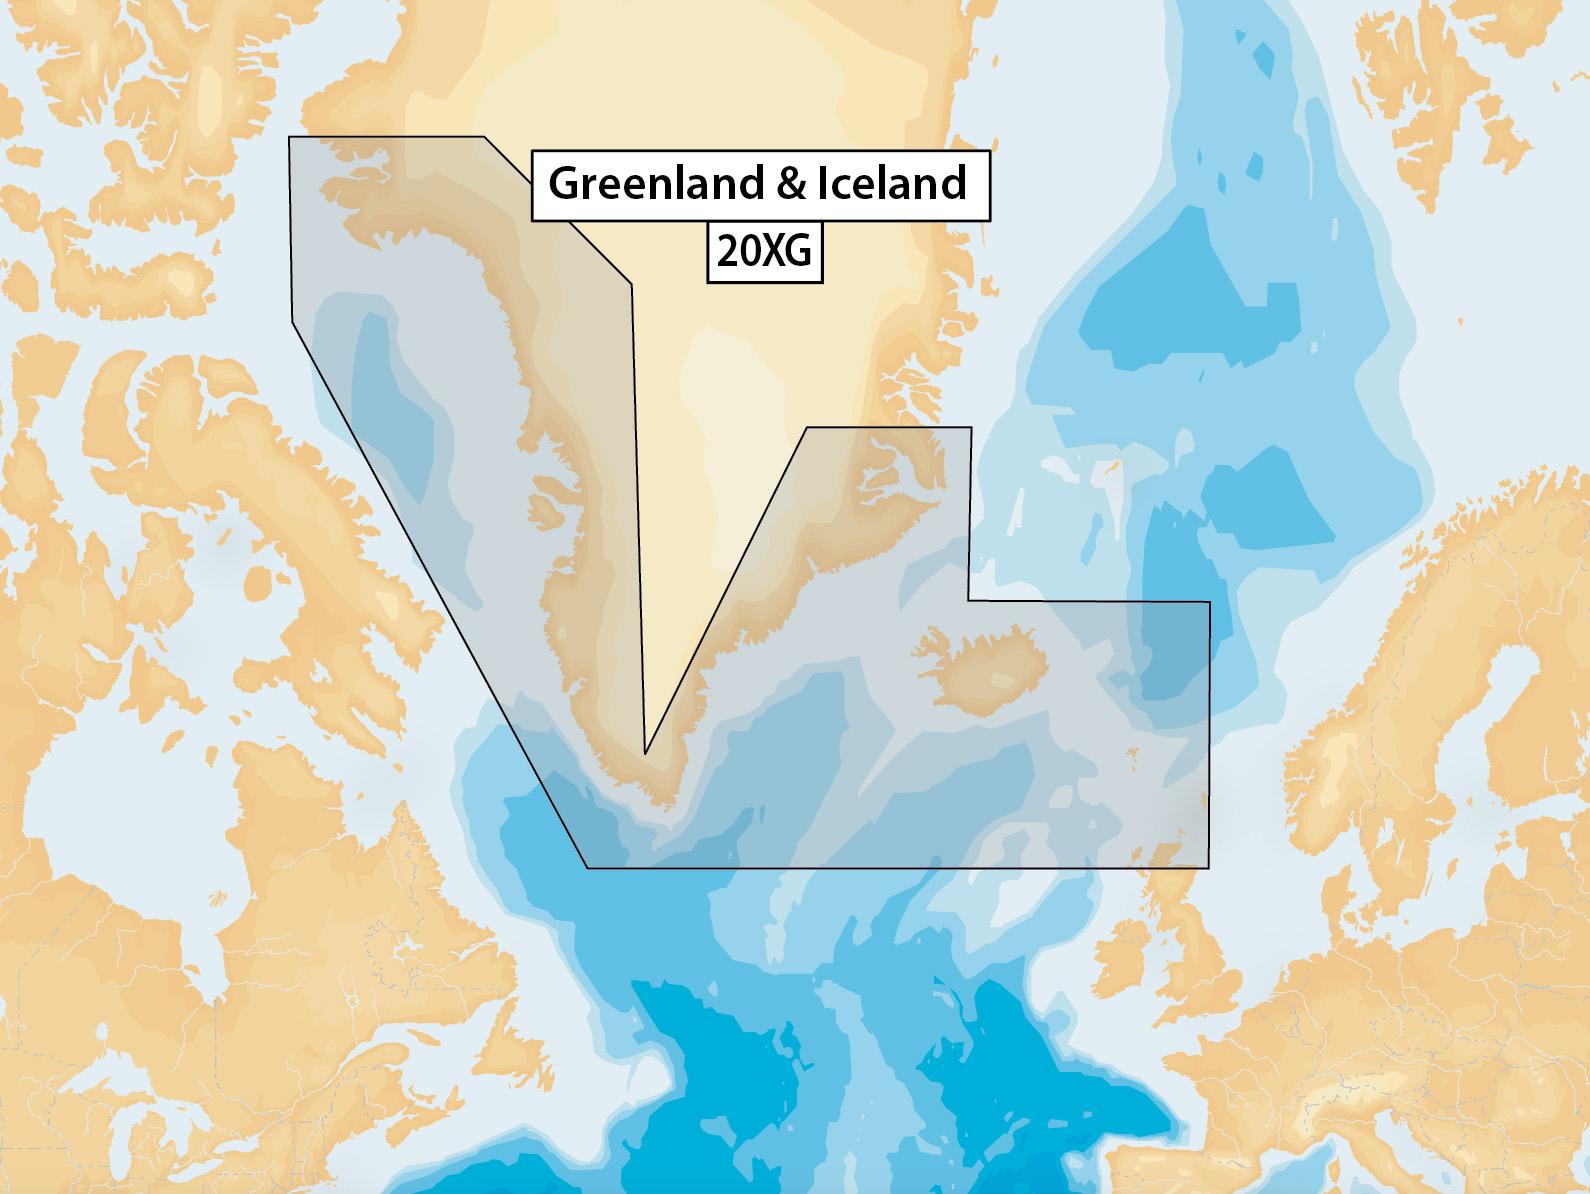 Navionics + Plus Preloaded Seekartenmodul mSD/SD Karte 20XG Grönland und Island